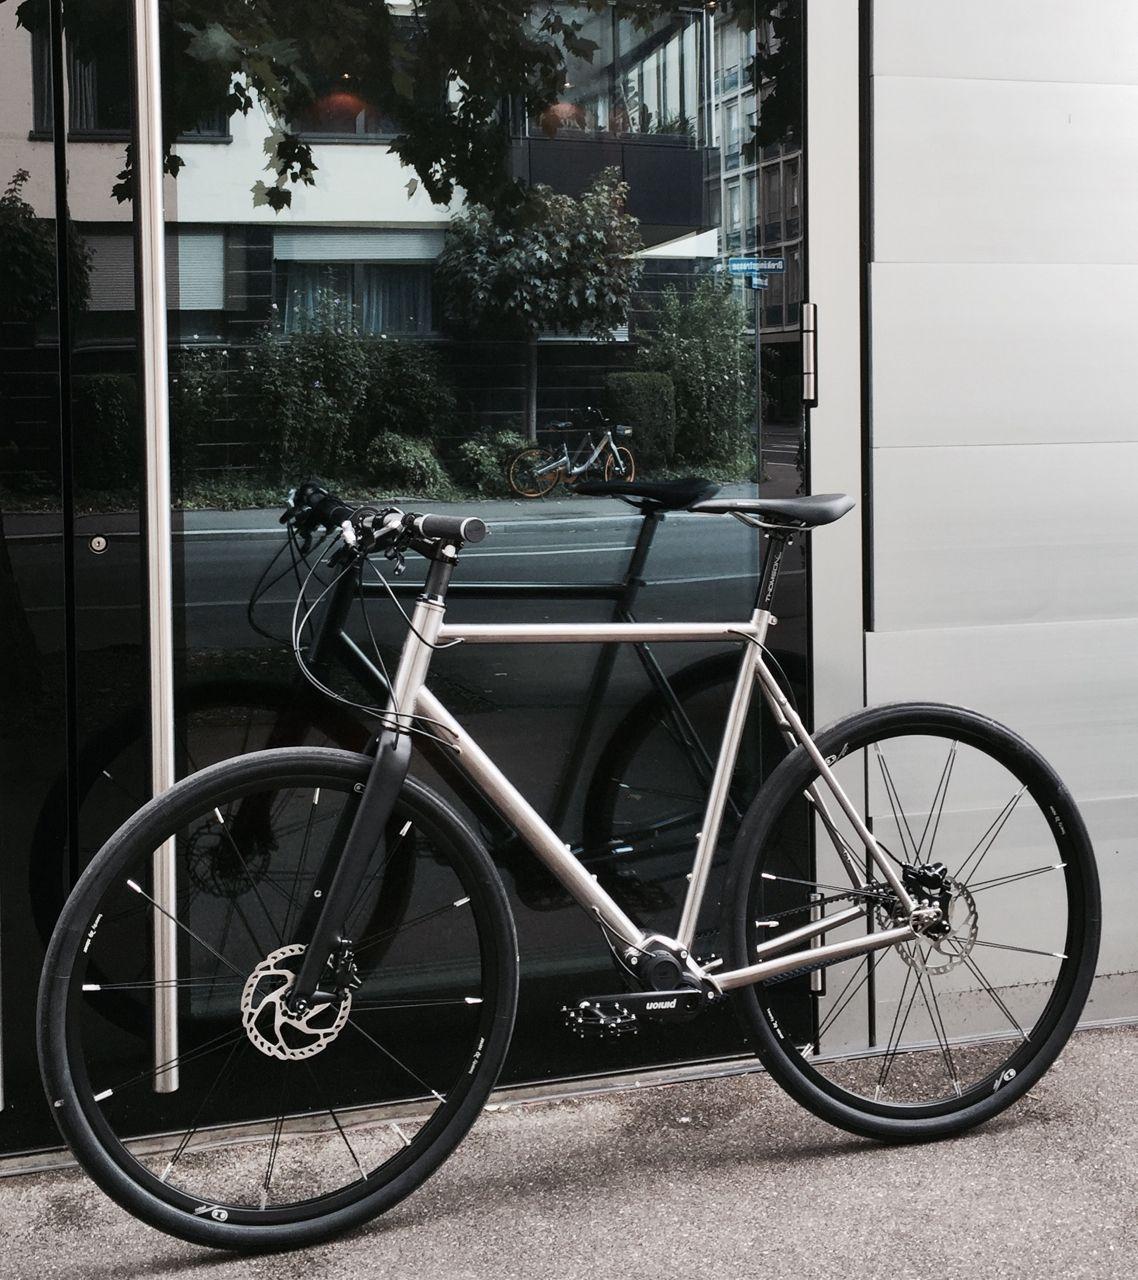 Pin on Bikes to Ride that bring Joy